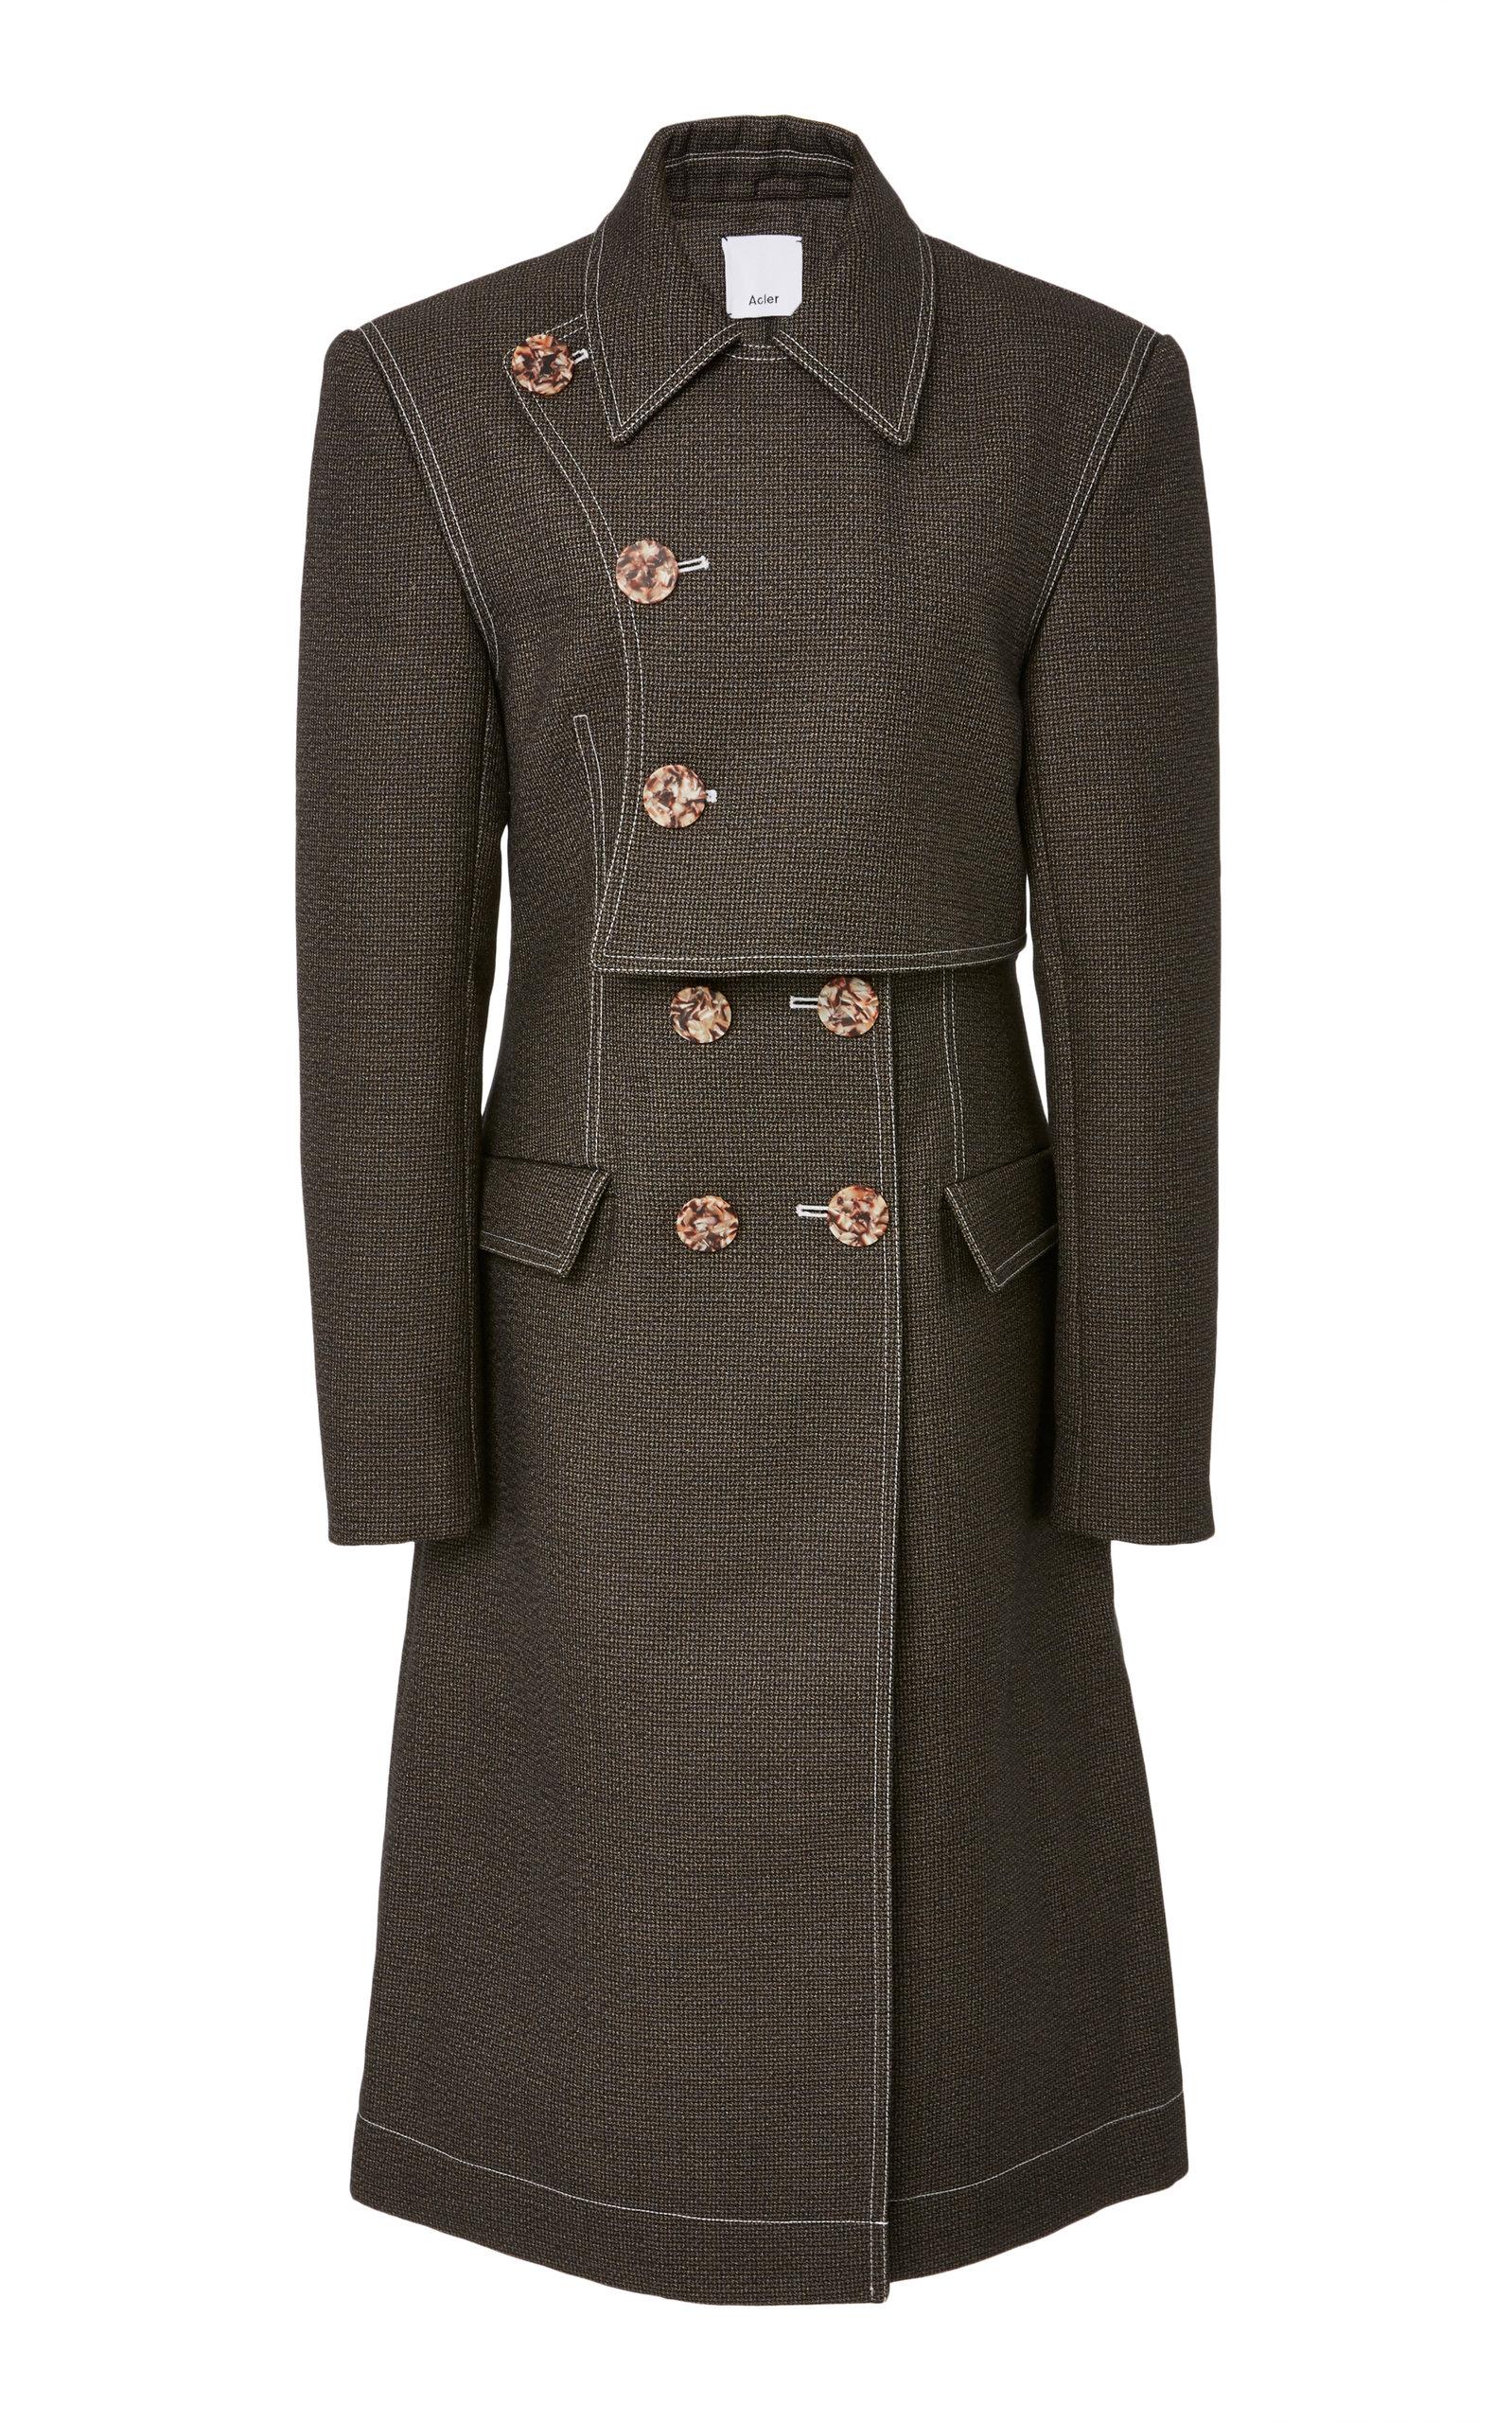 ACLER Union Denim Coat in Grey